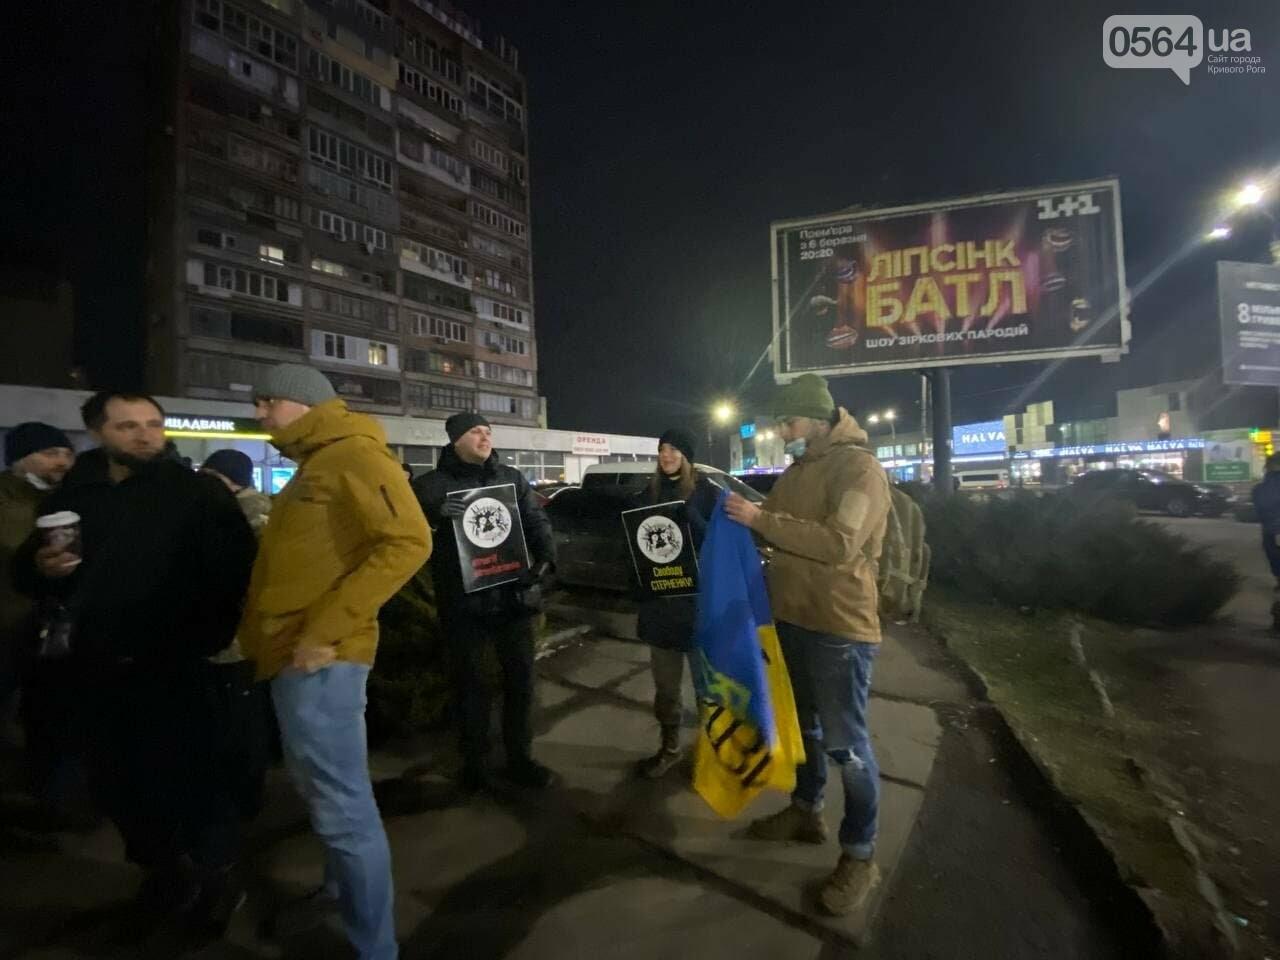 """Свободу політв'язням! #ВолюСтерненку #FreeRiffmaster"", - в Кривом Роге активисты вышли на протест, - ФОТО, ВИДЕО, фото-5"